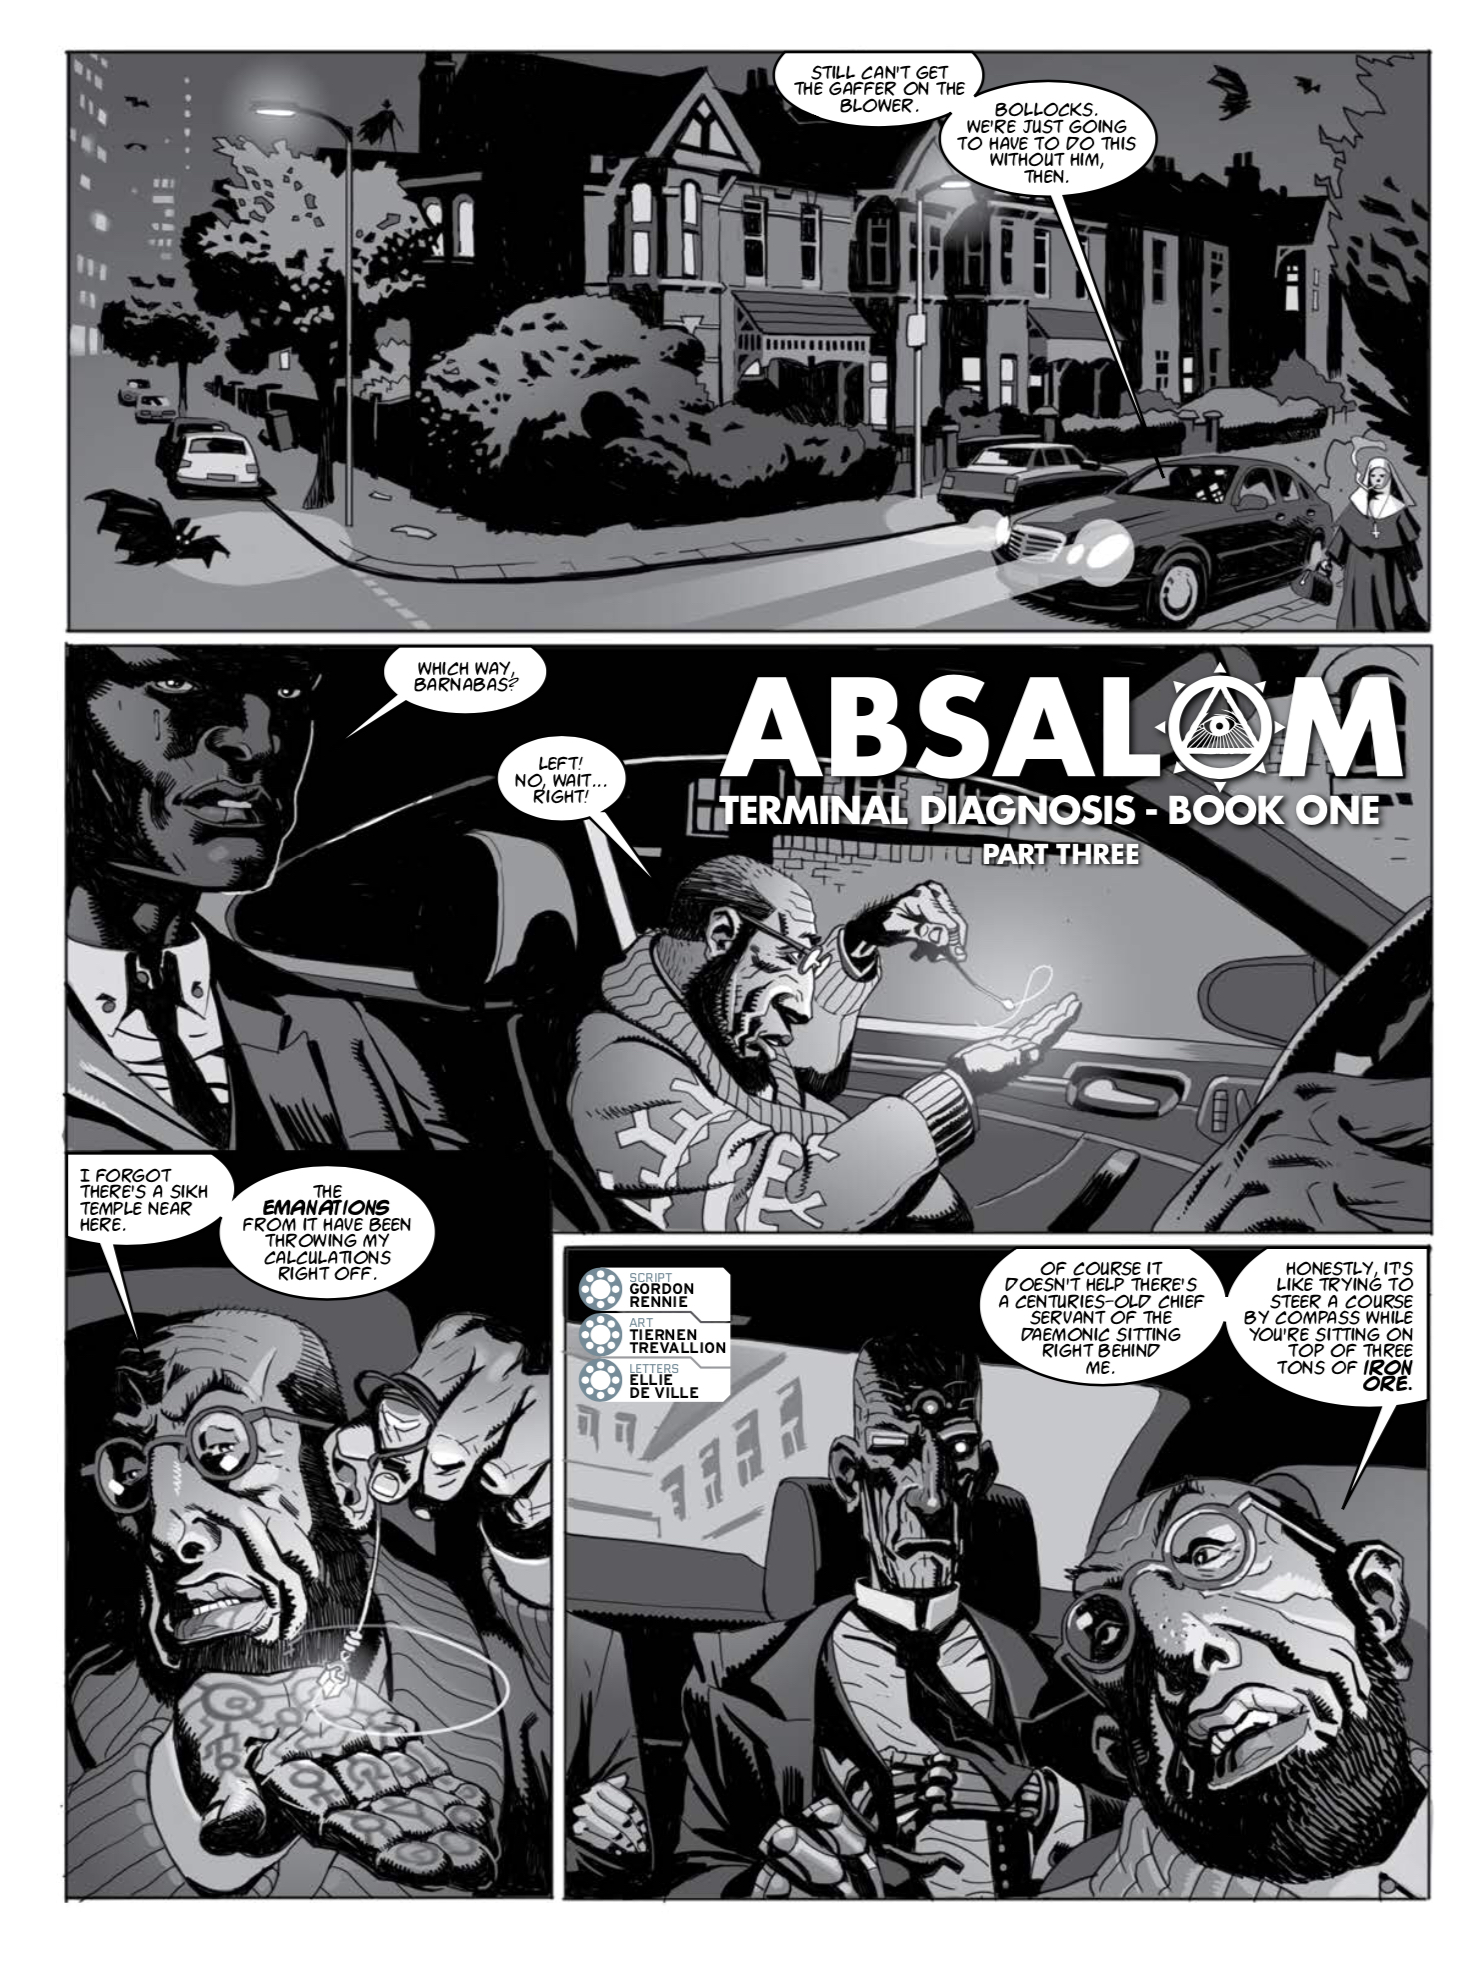 2000AD Prog 2055 - Absalom